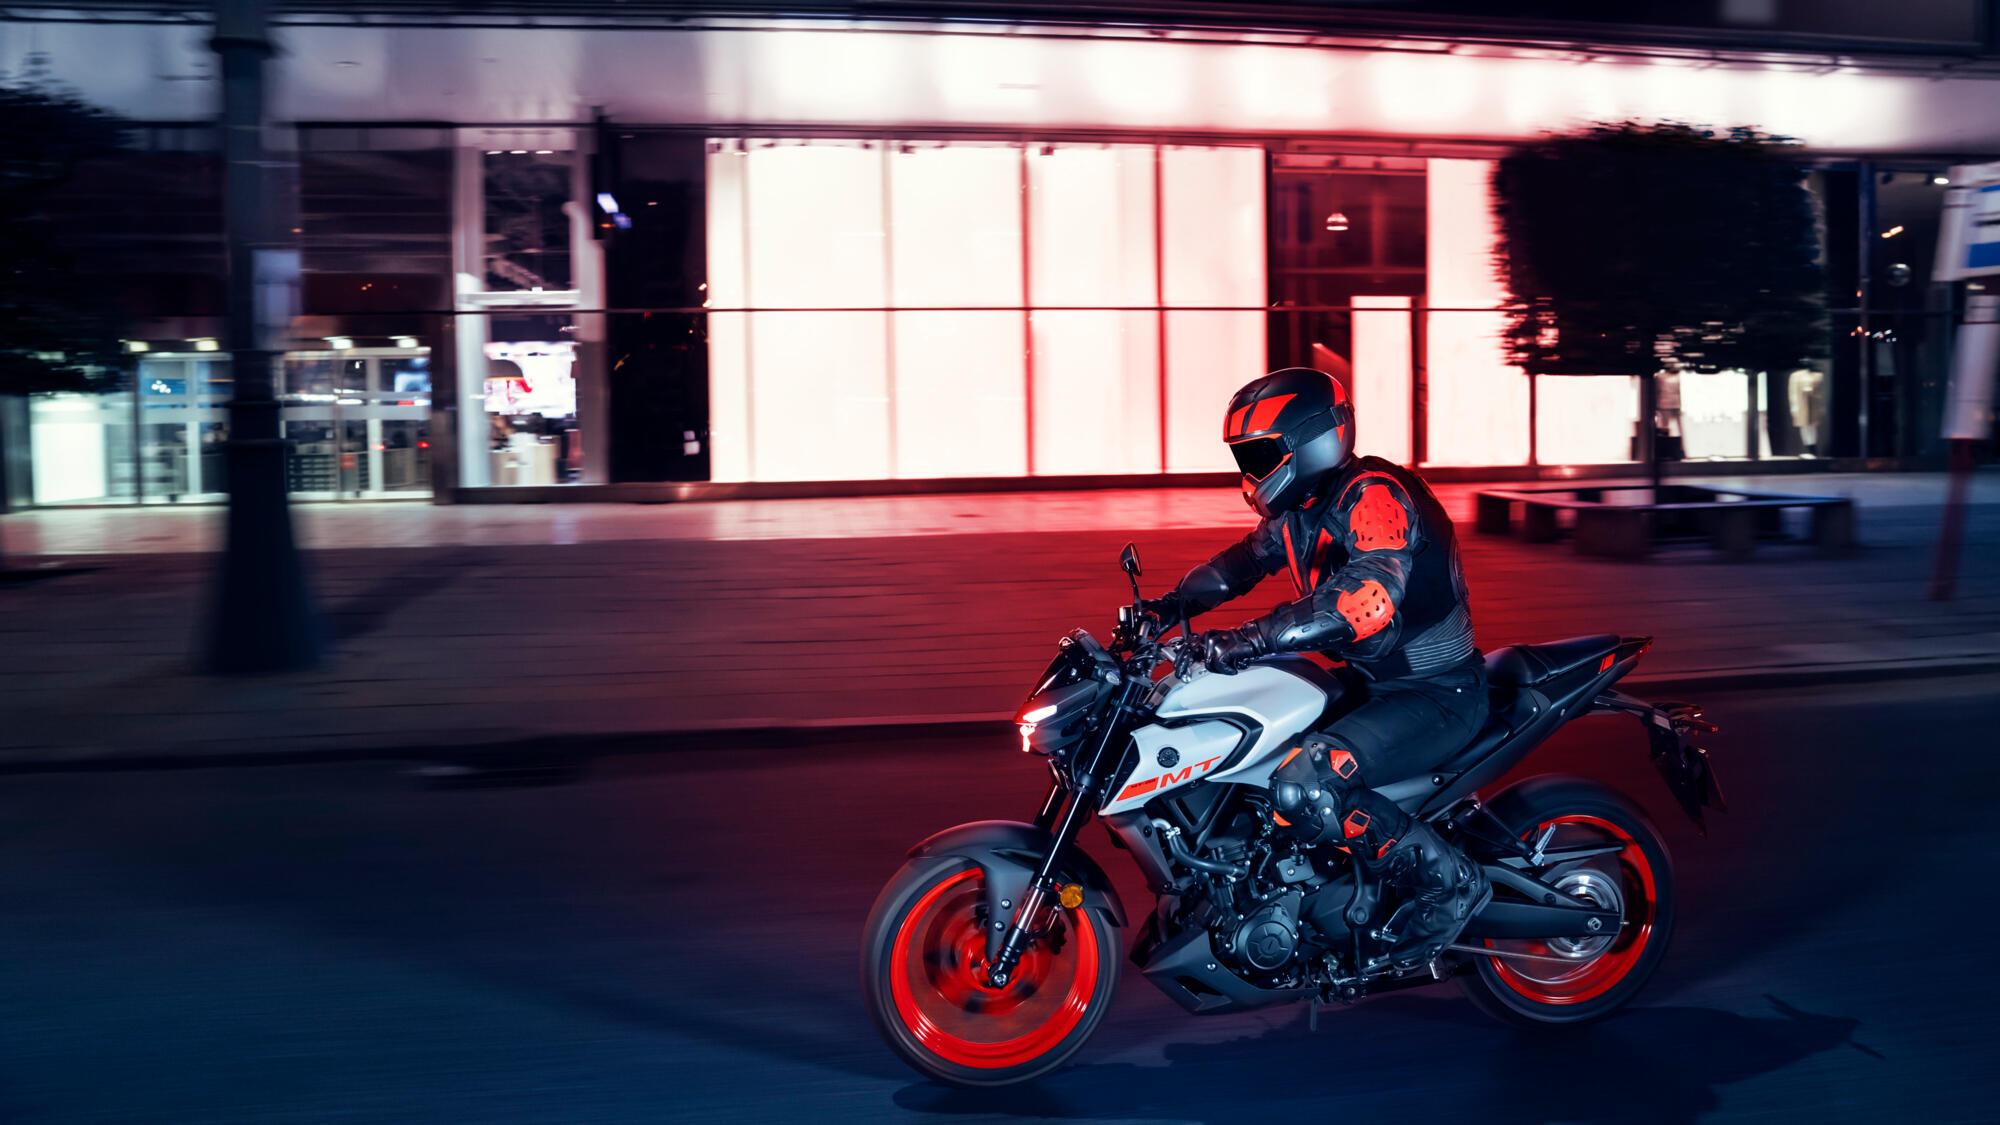 2020-Yamaha-MT320-EU-Ice_Fluo-Action-001